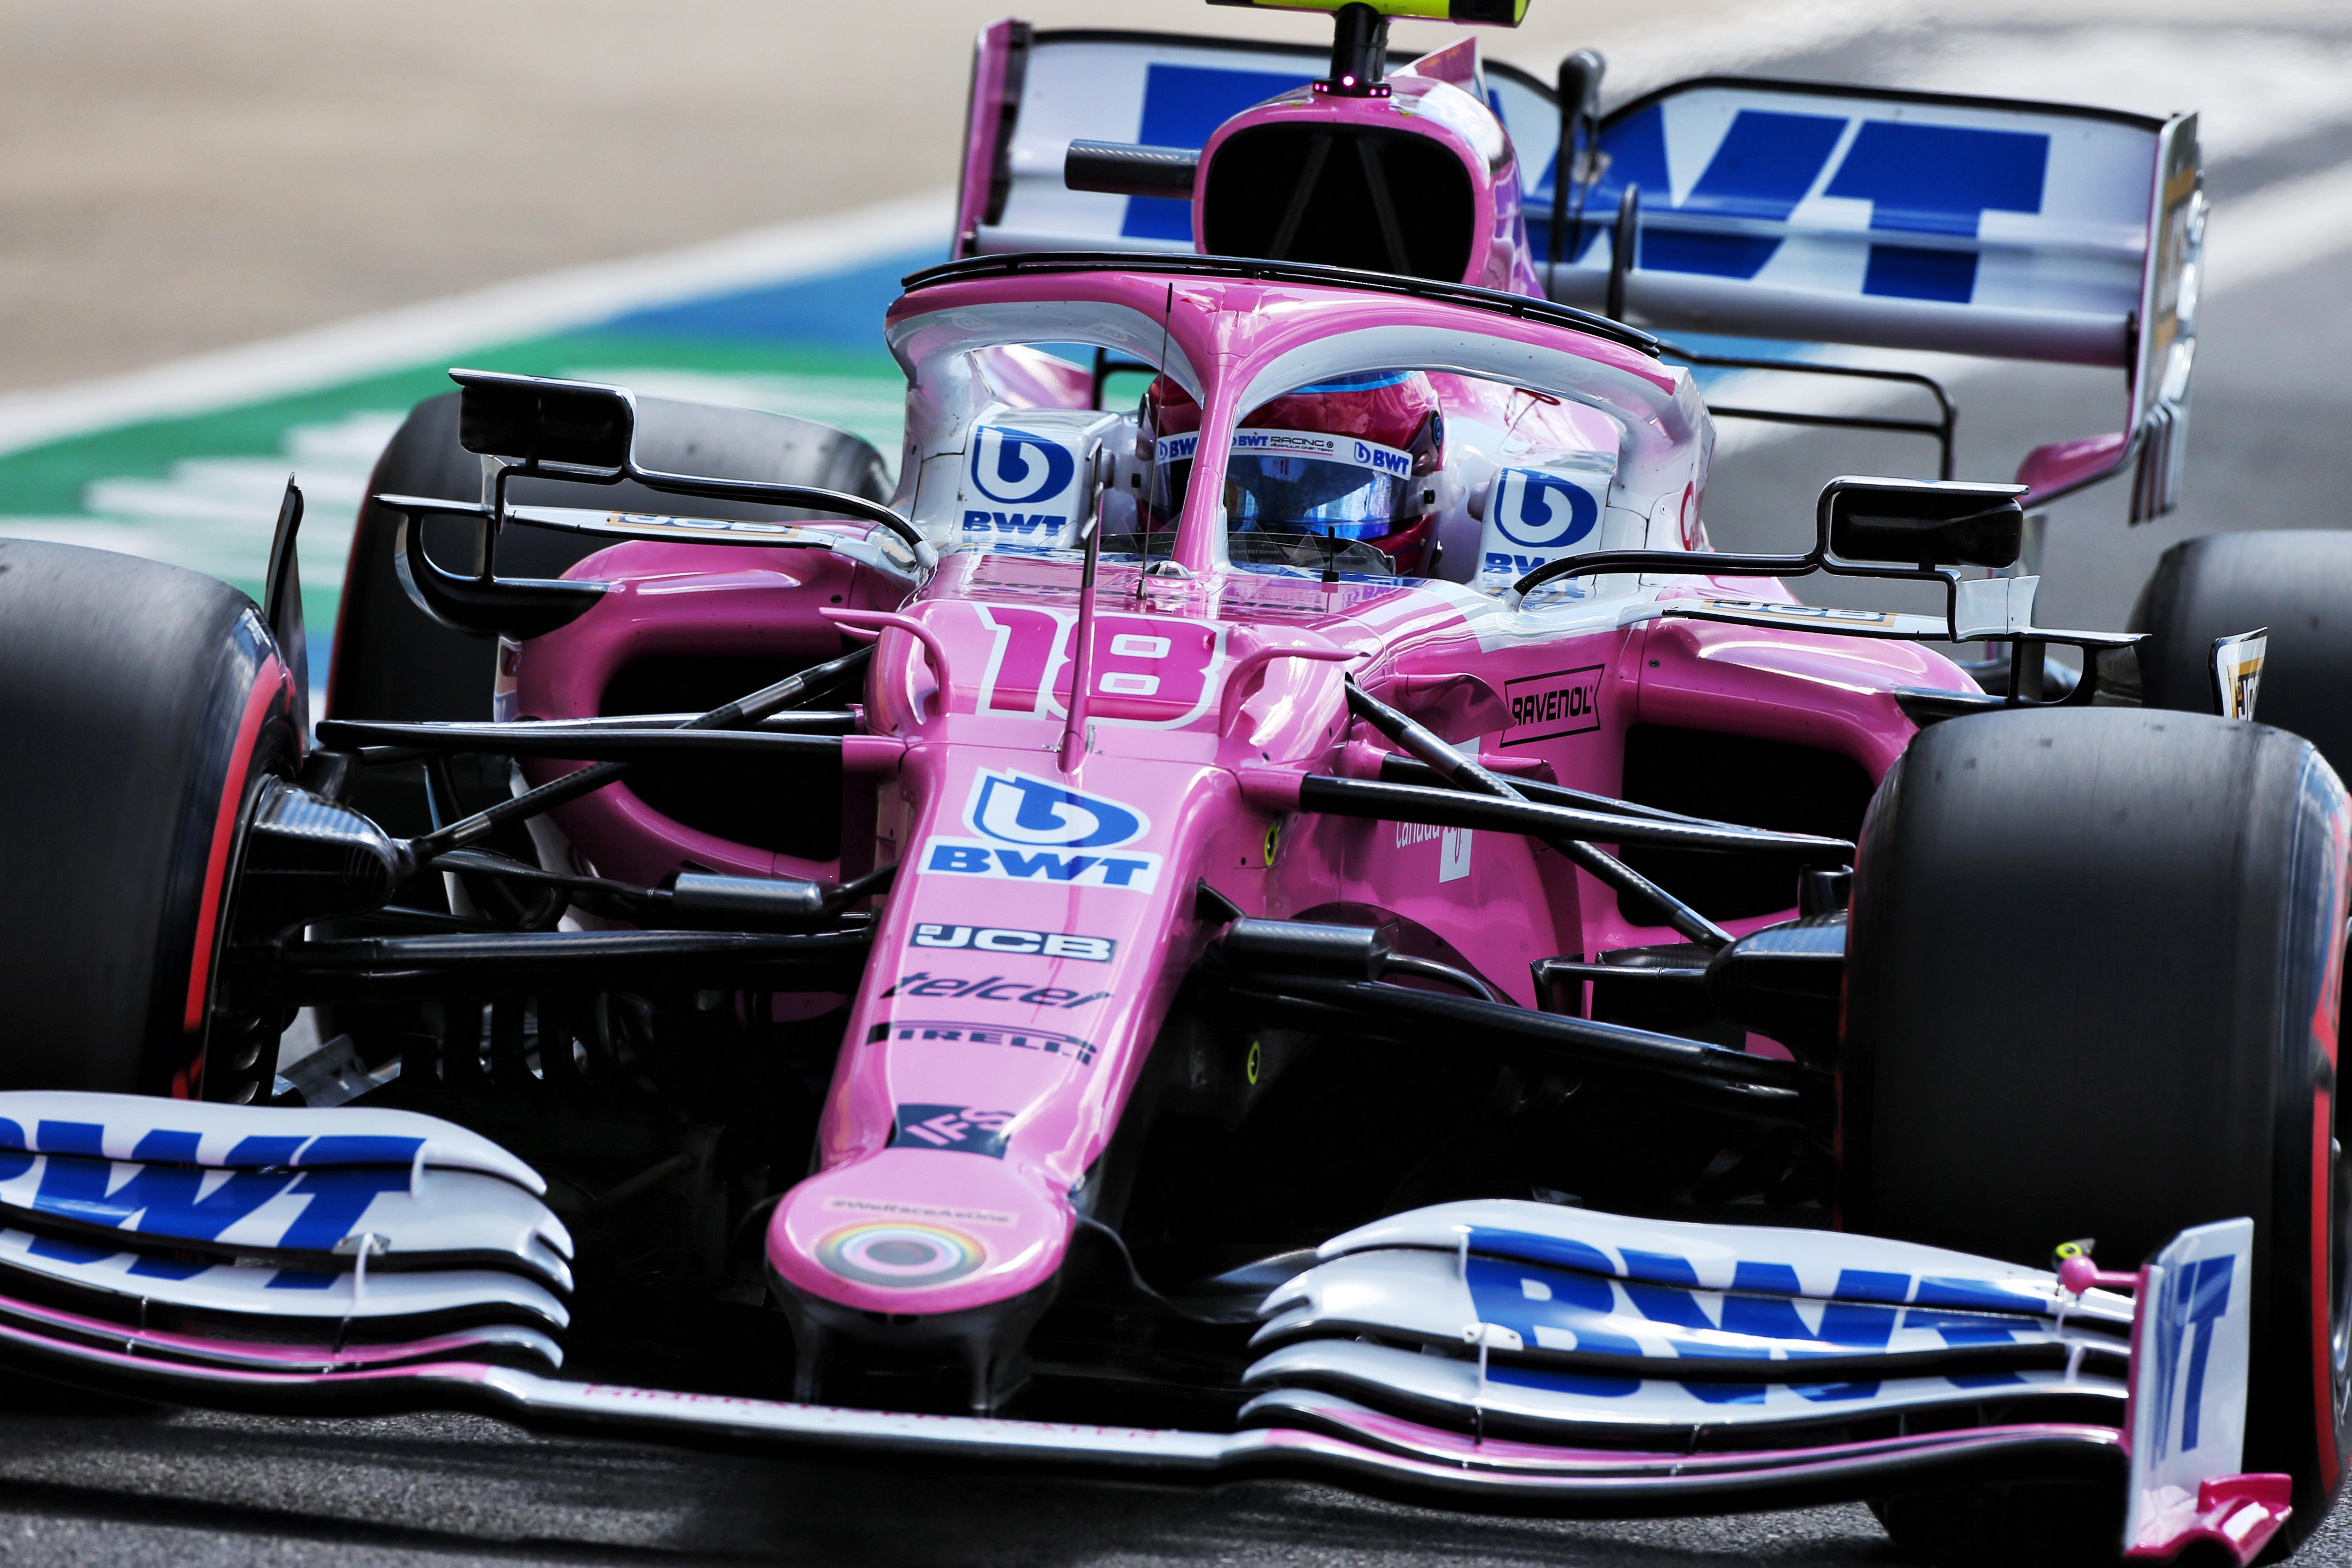 Lance Stroll Racing Point F1 2020